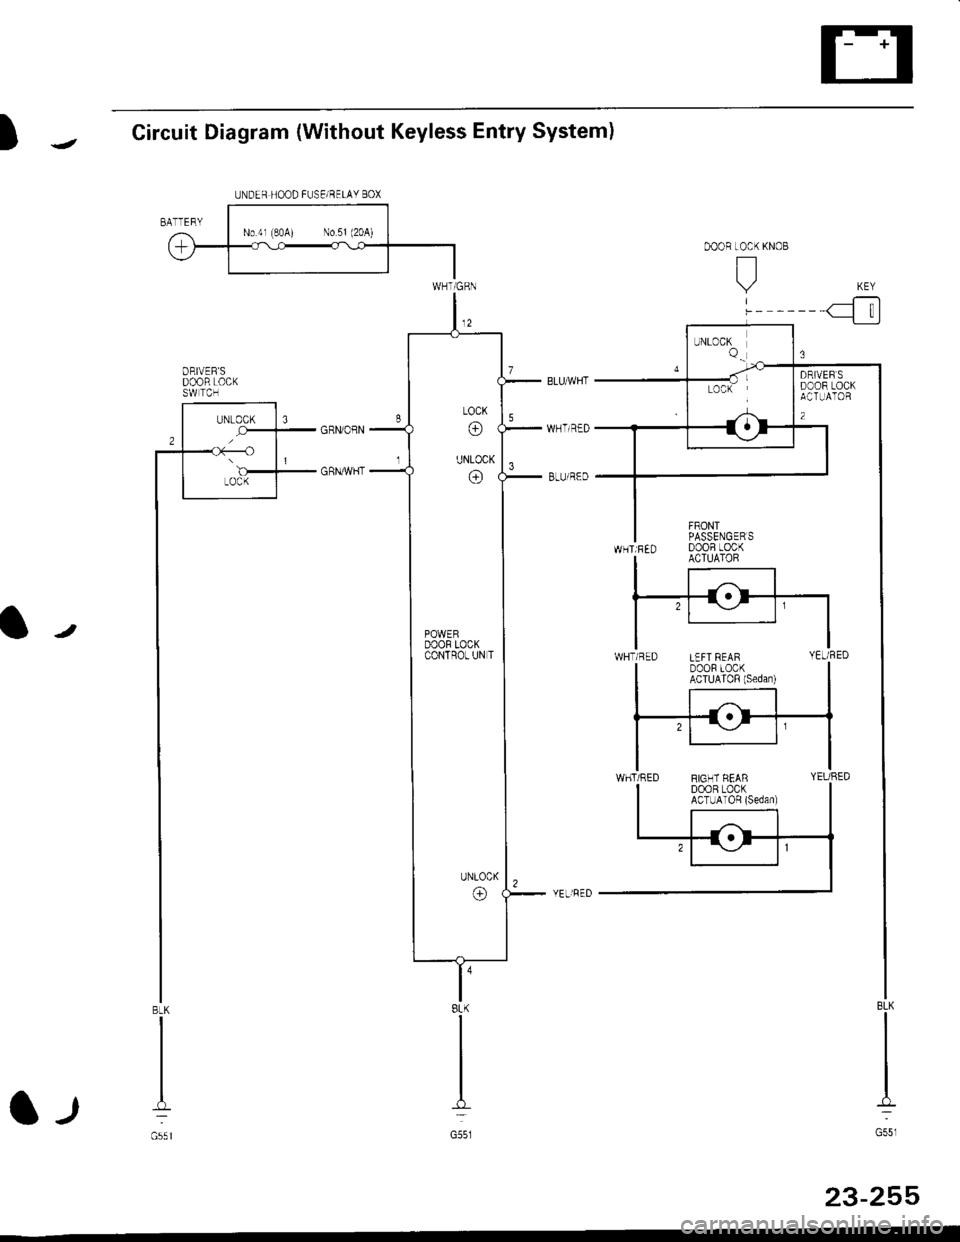 Honda Civic 1998 6g Workshop Manual Central Locking Wiring Diagram